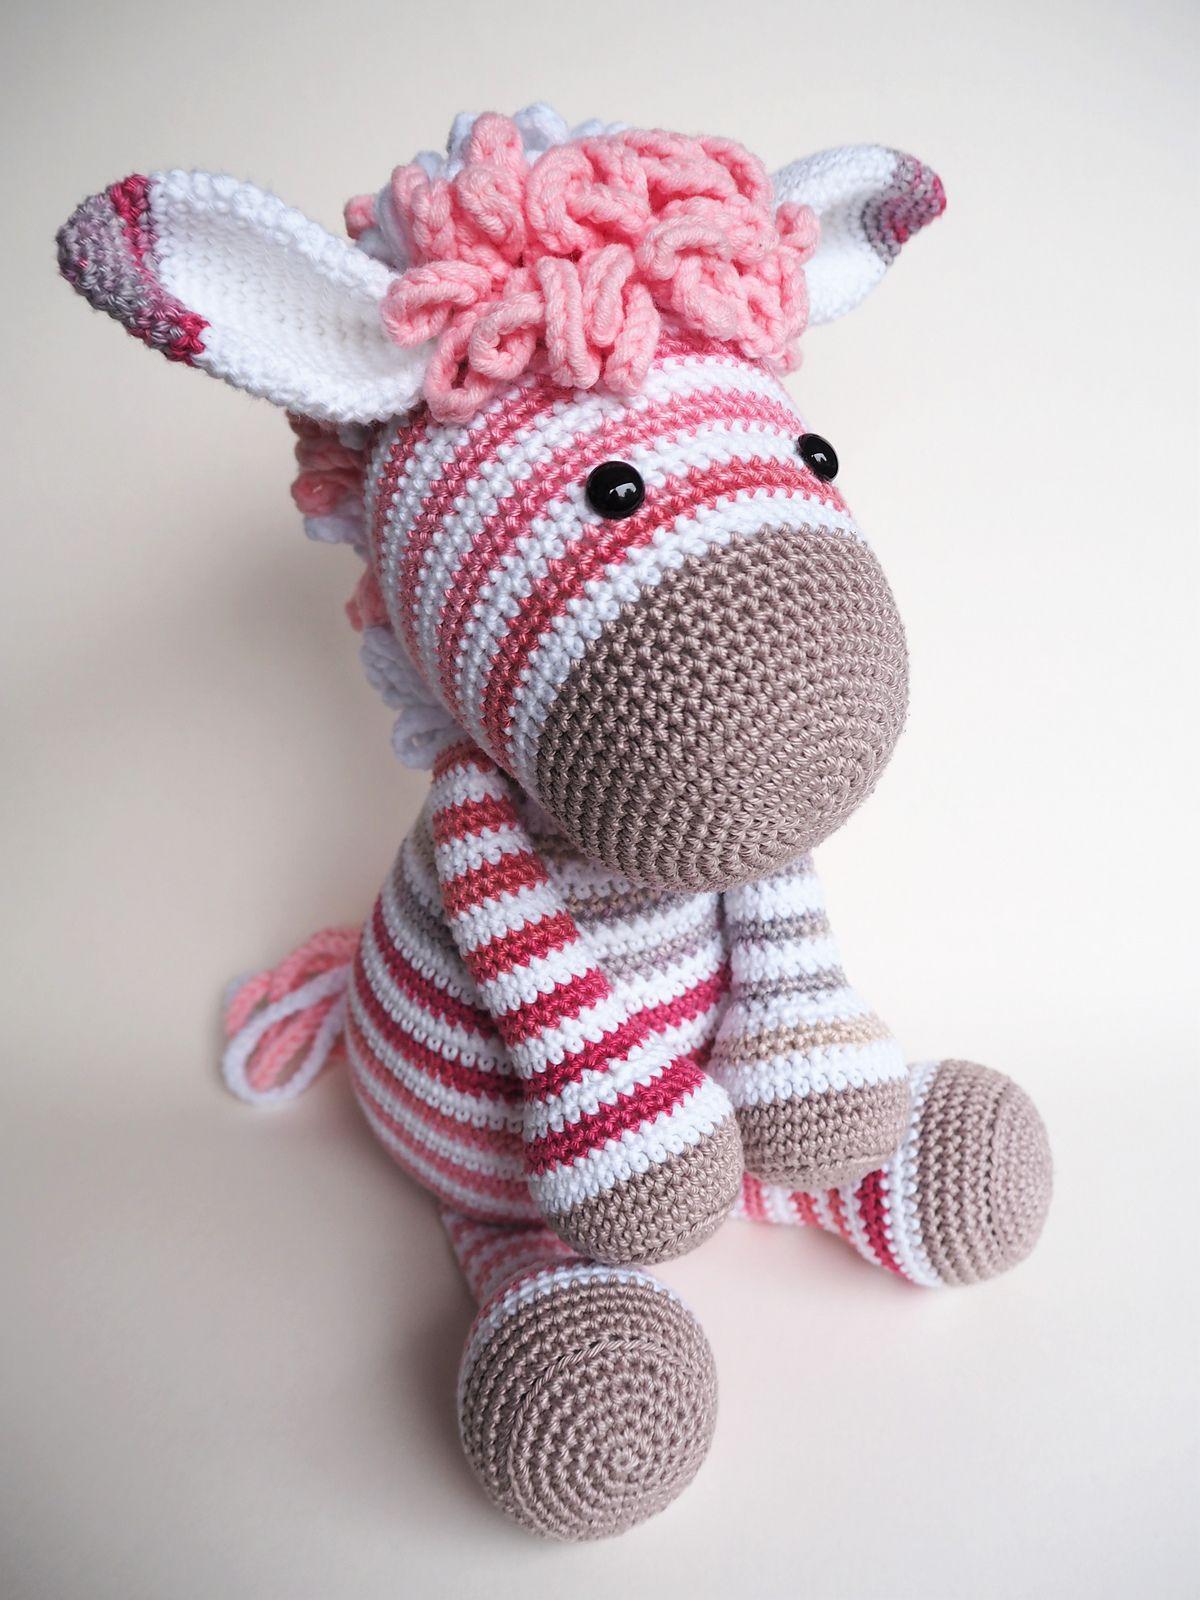 Zoe Zebra pattern by Rosanne Briggeman | Pecas, Mandalas y Curiosidad